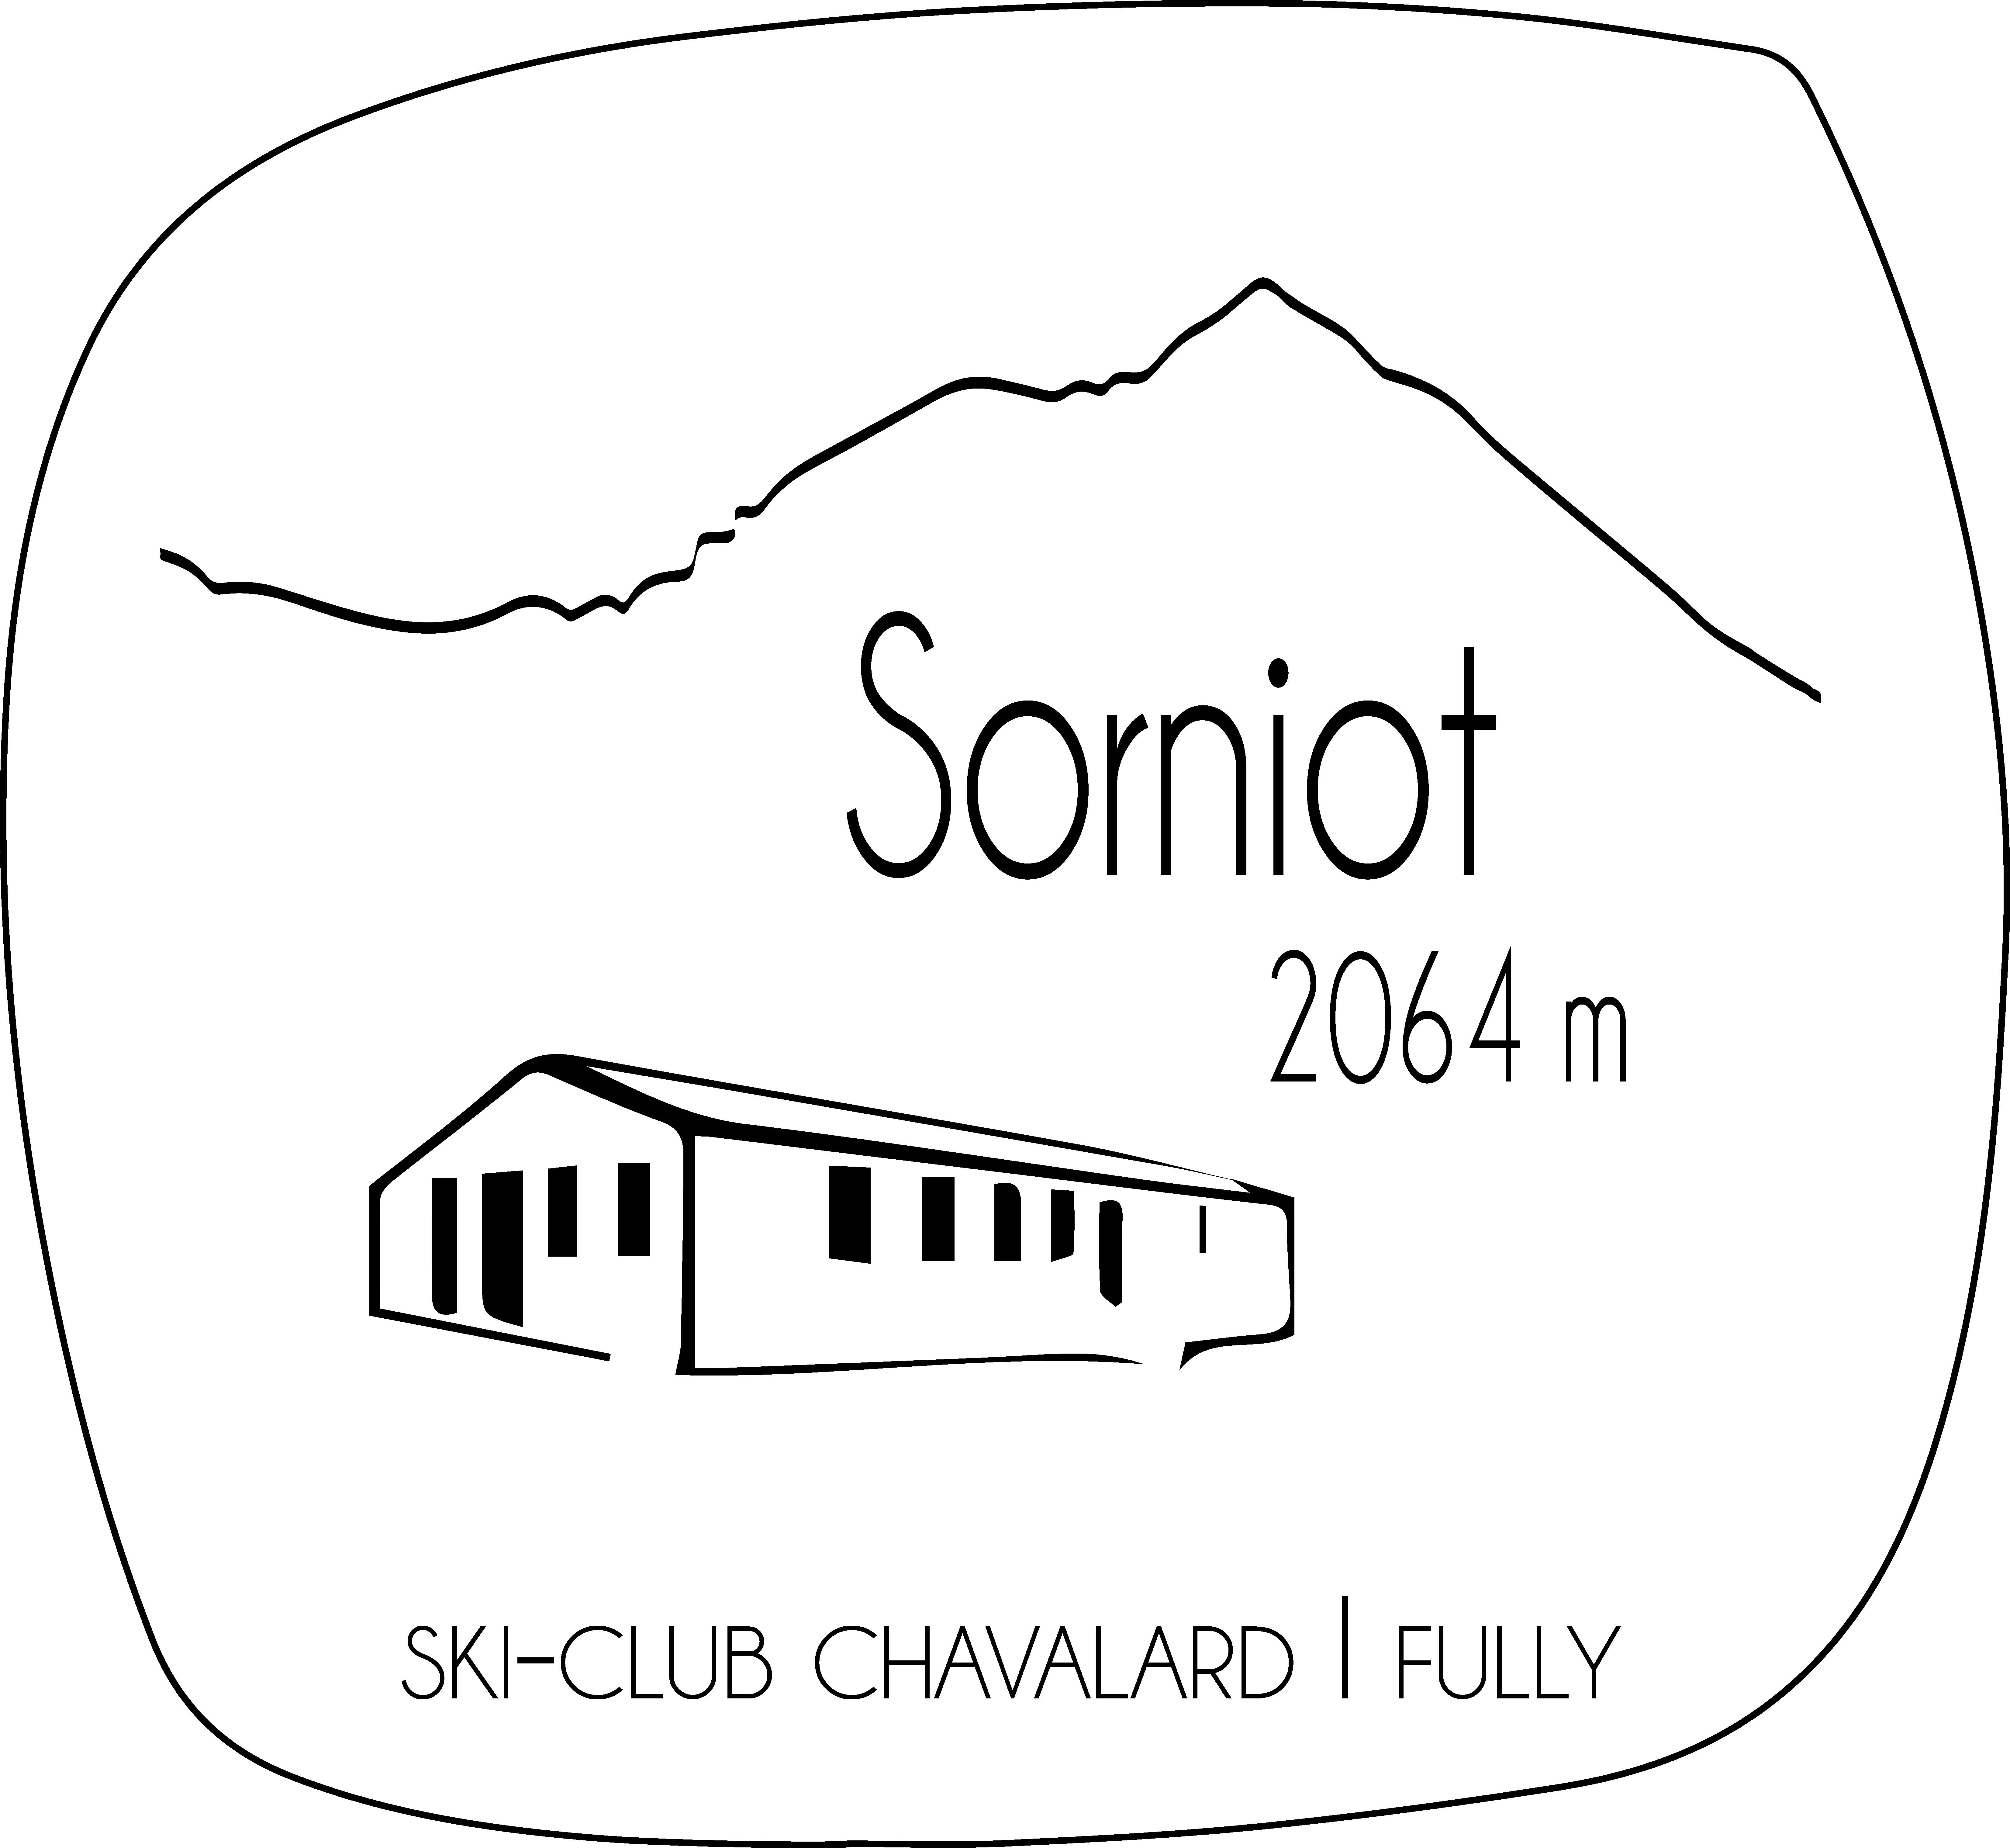 Cabane de Sorniot